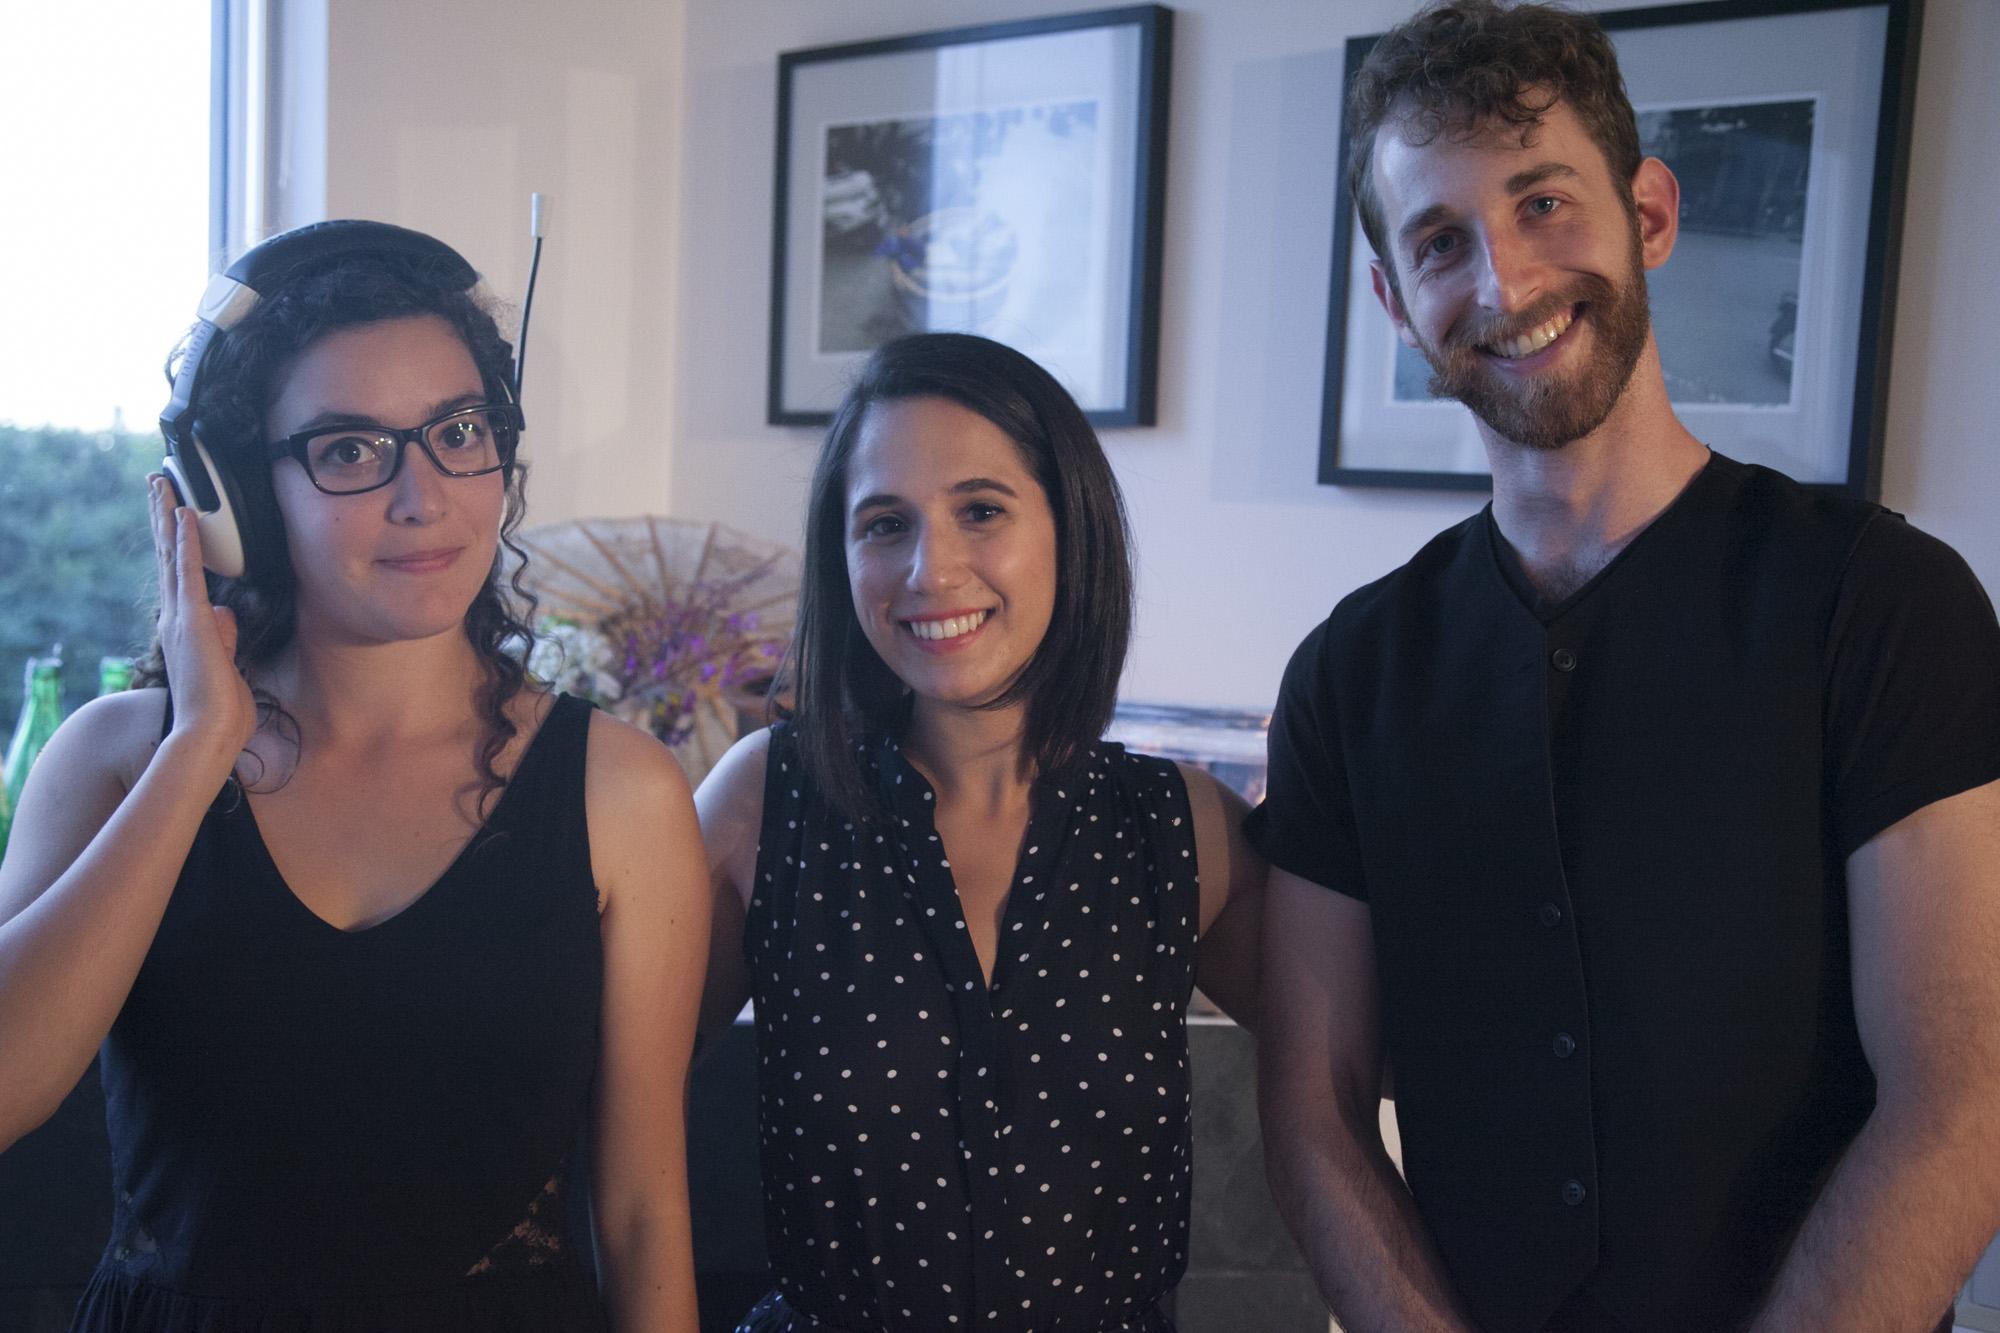 Annie Therrien-Boulos, Sarah Faye Bernstein & Daniel O'Shea – Photo by Harley Spade